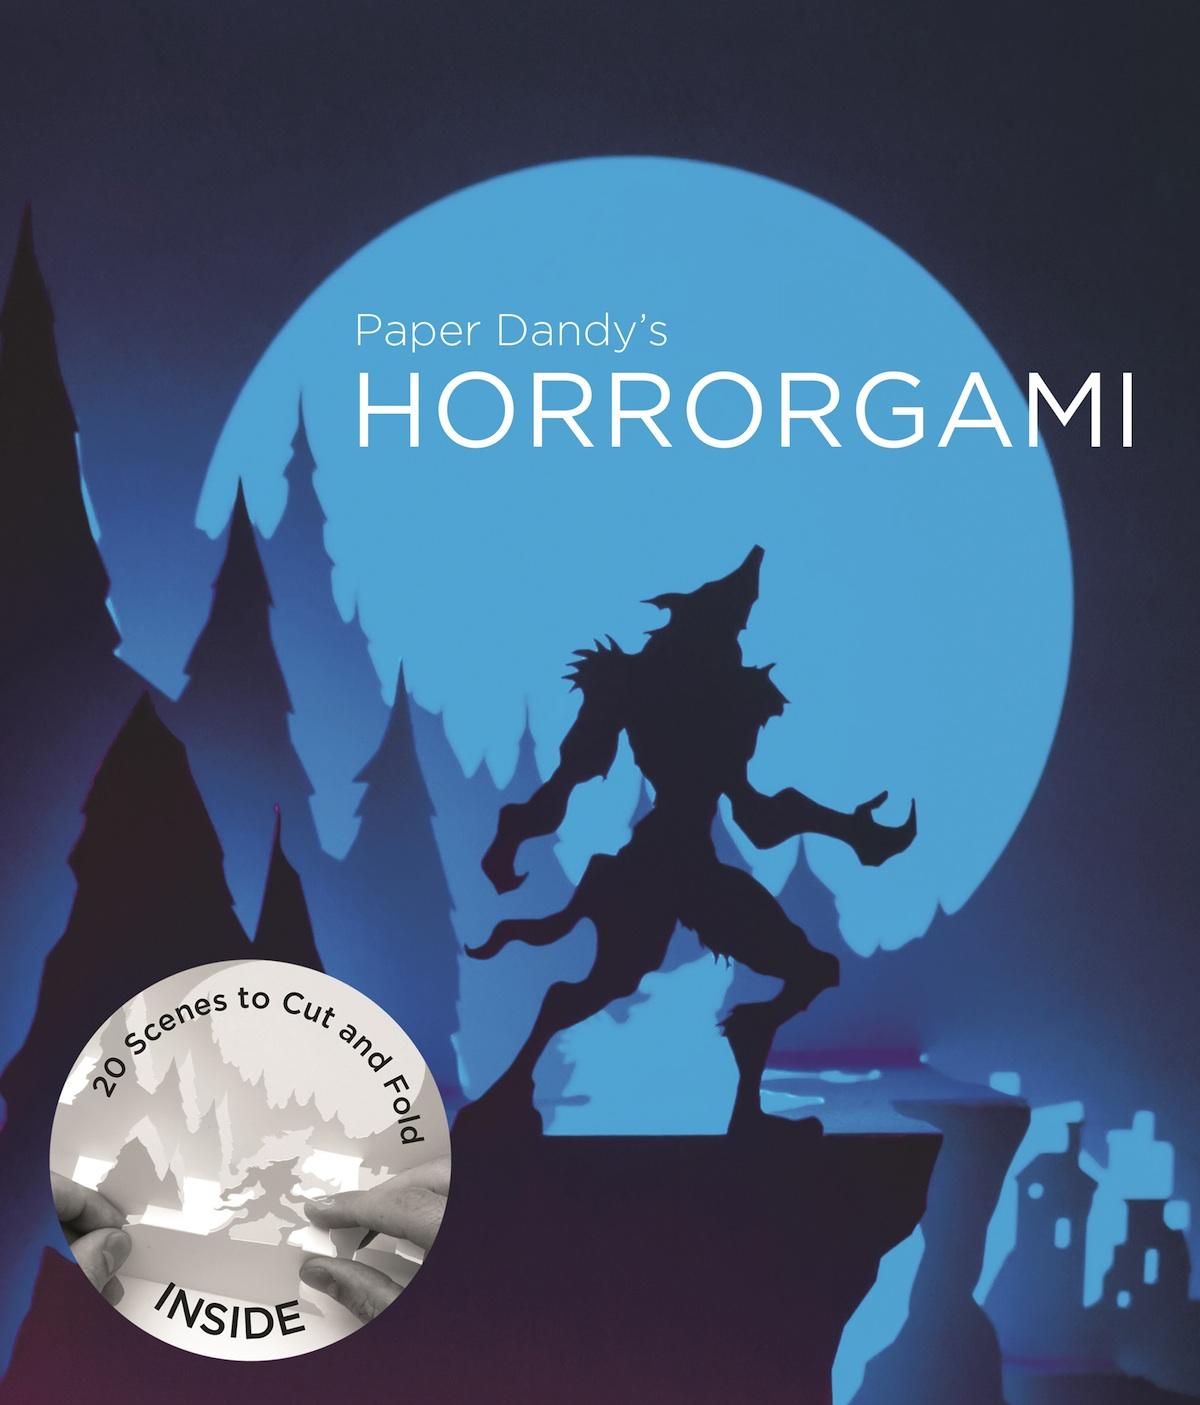 horrorgami book design